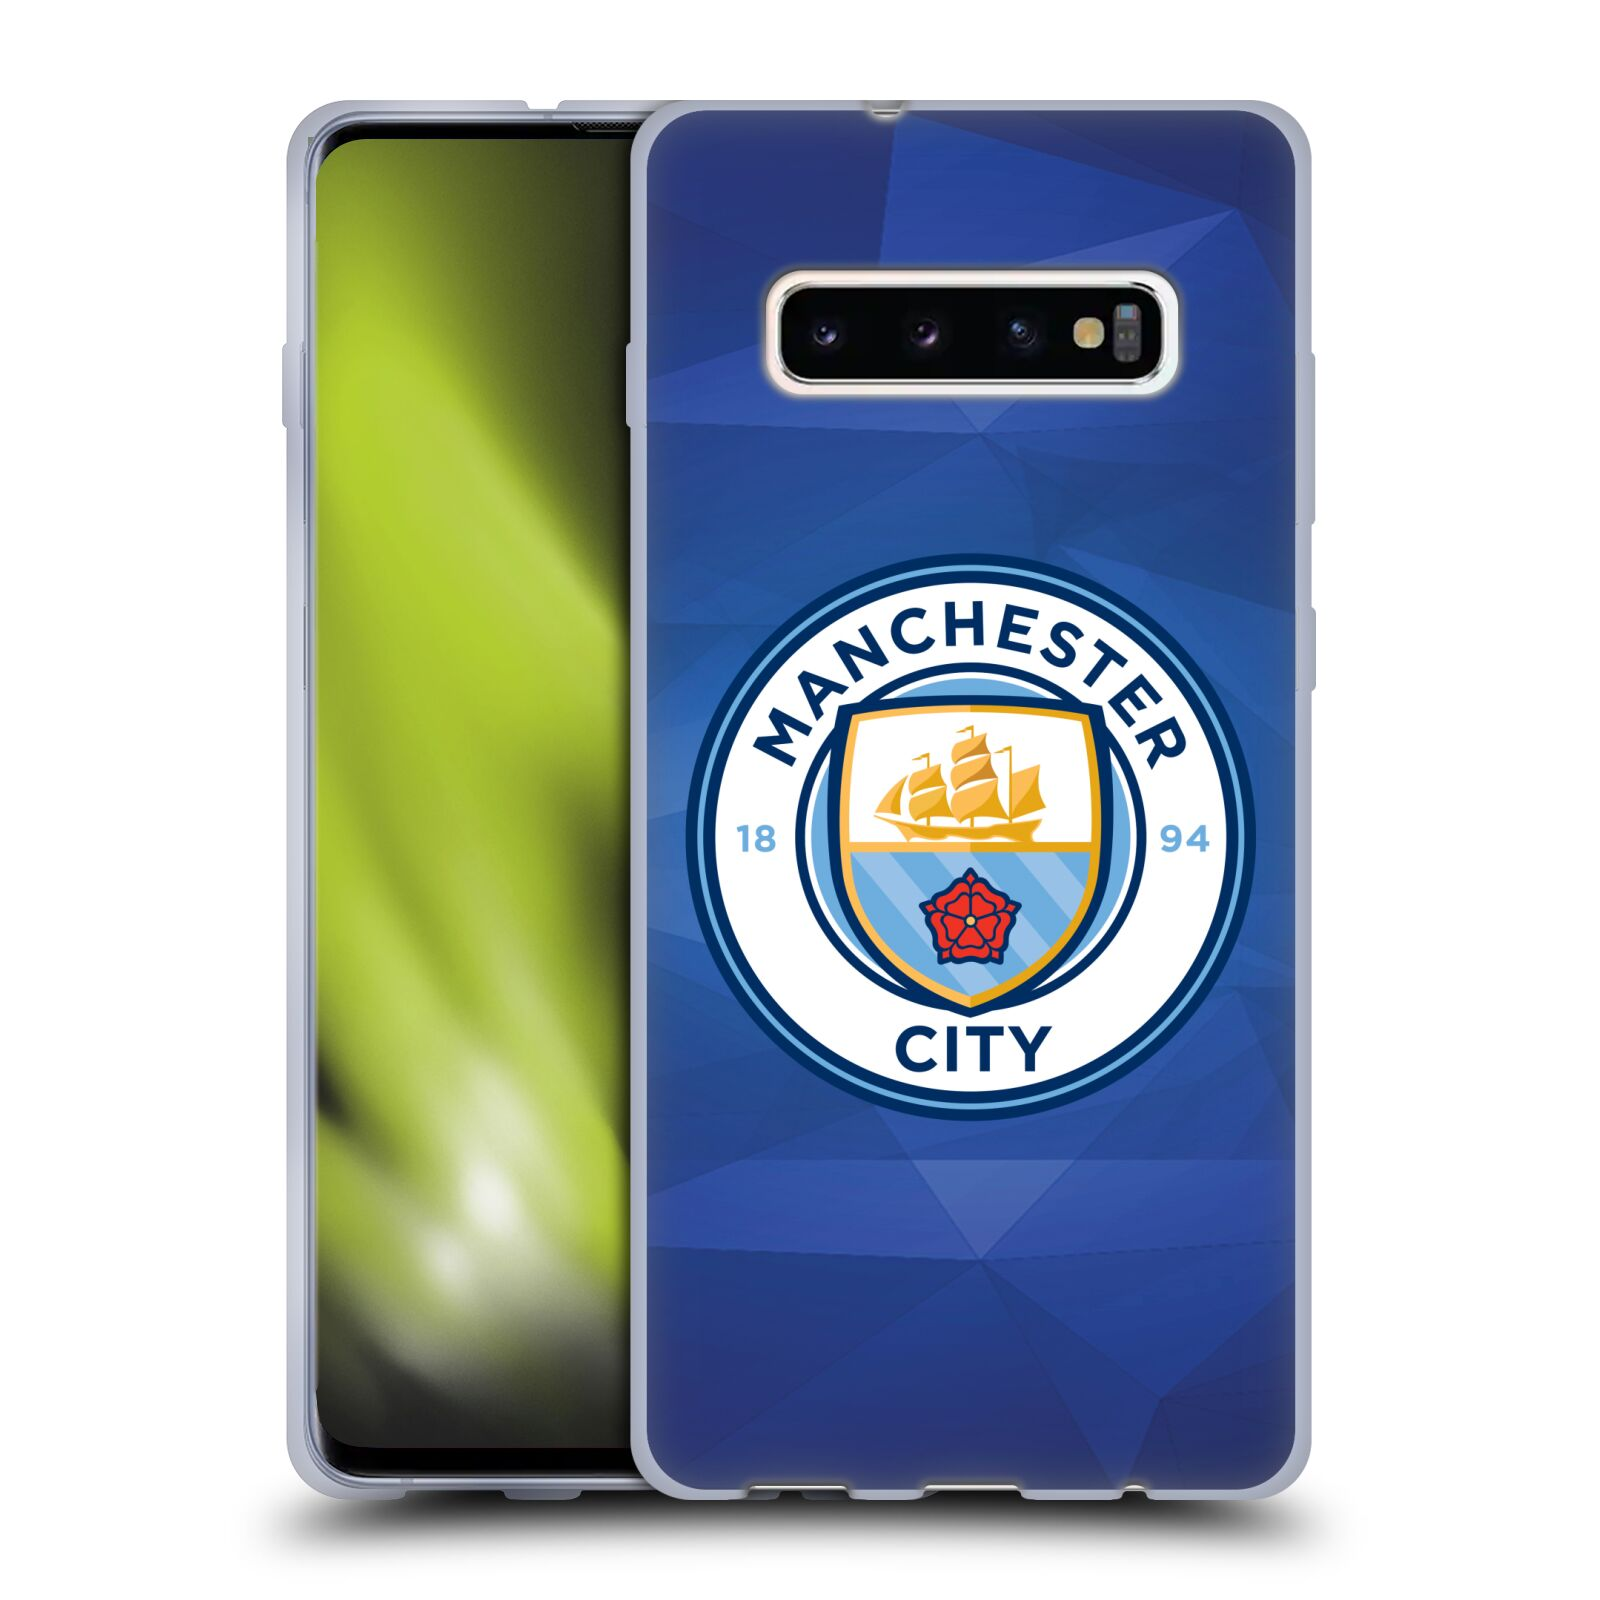 Silikonové pouzdro na mobil Samsung Galaxy S10 Plus - Head Case - Manchester City FC - Modré nové logo